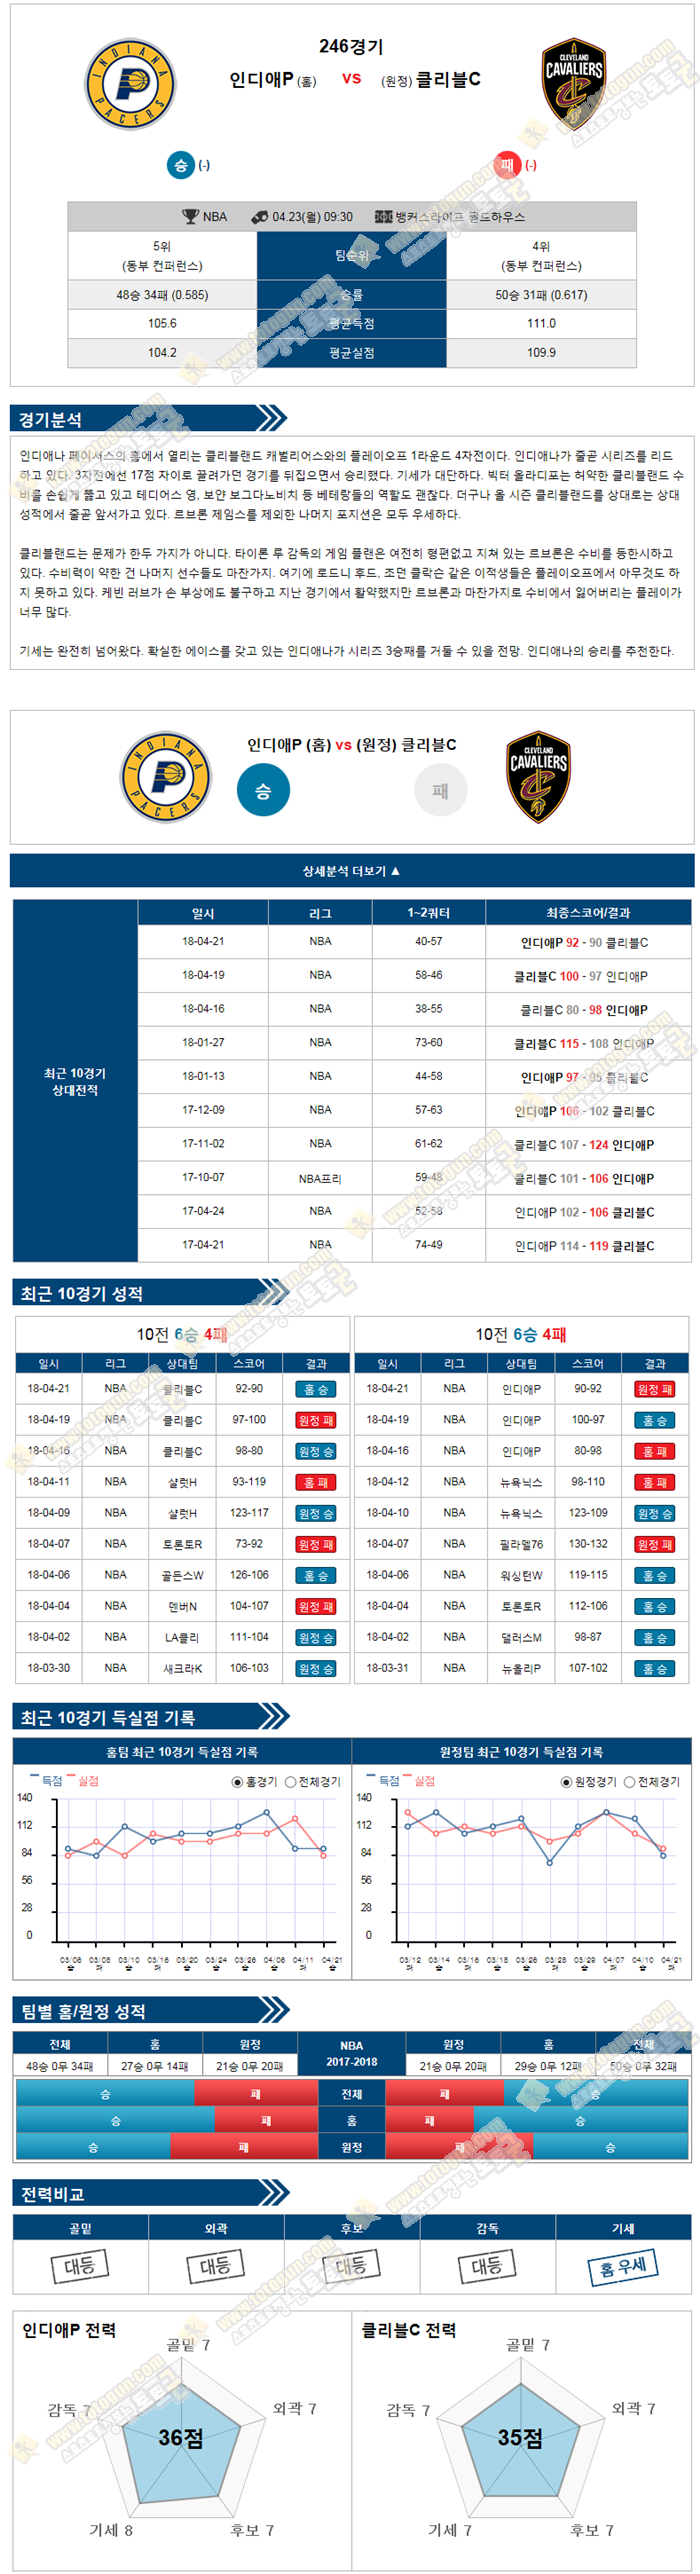 Sports cash system bet levels chenglei mining bitcoins